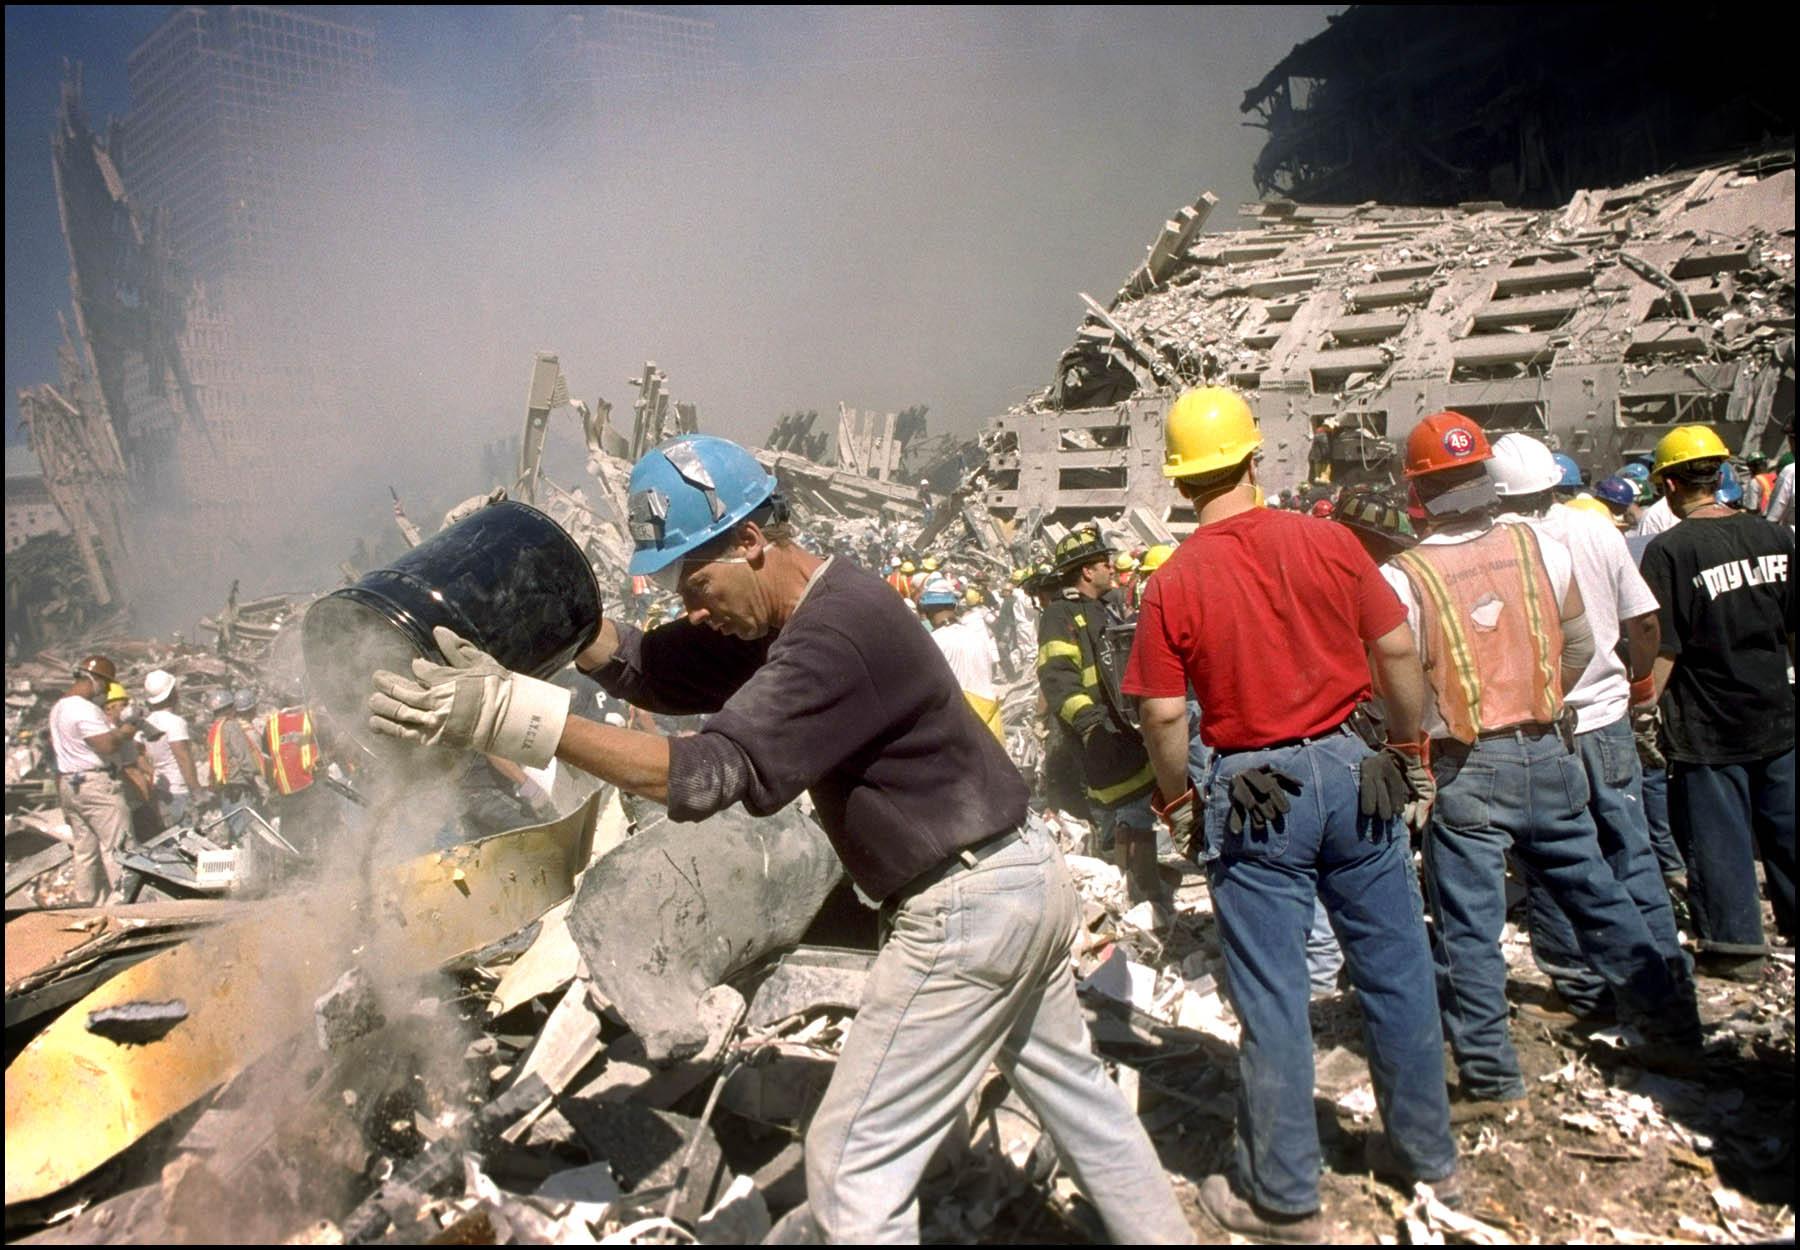 9-11-2001_010